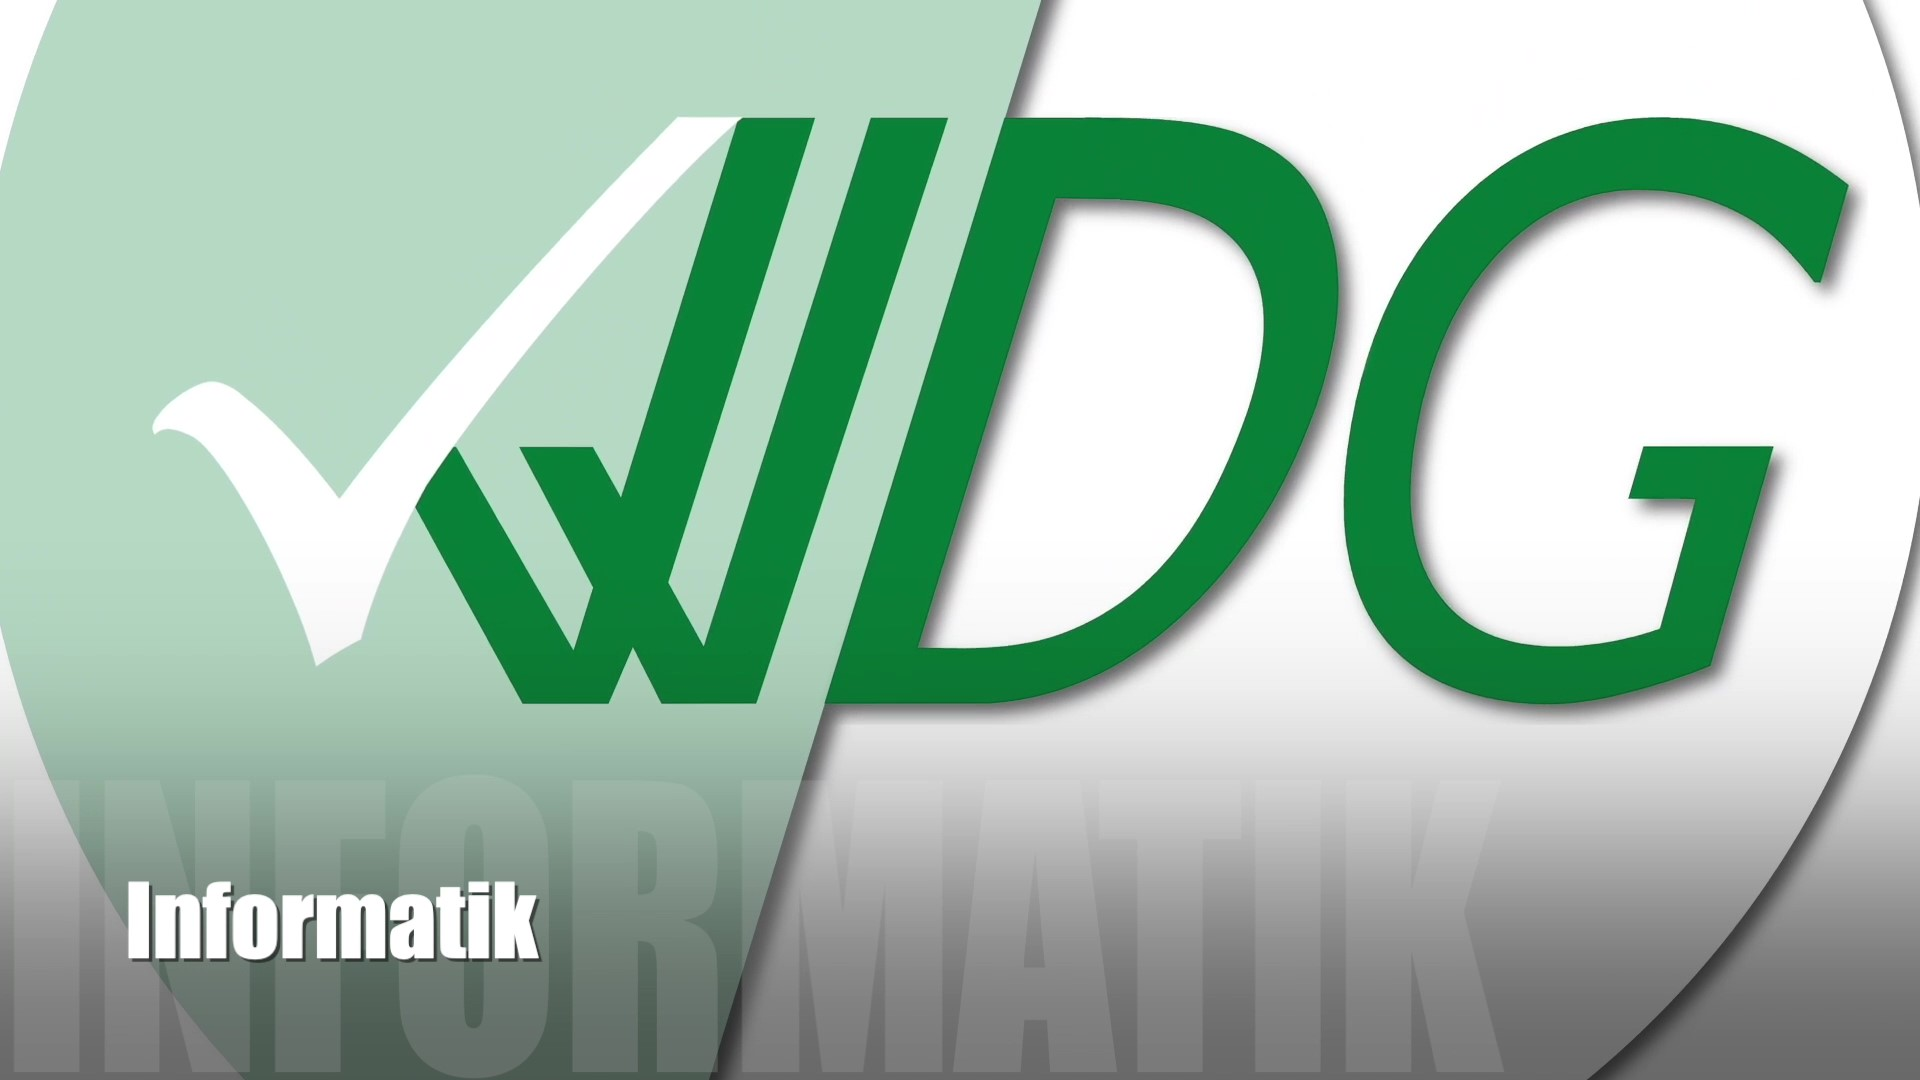 Informatik WDG_Moment